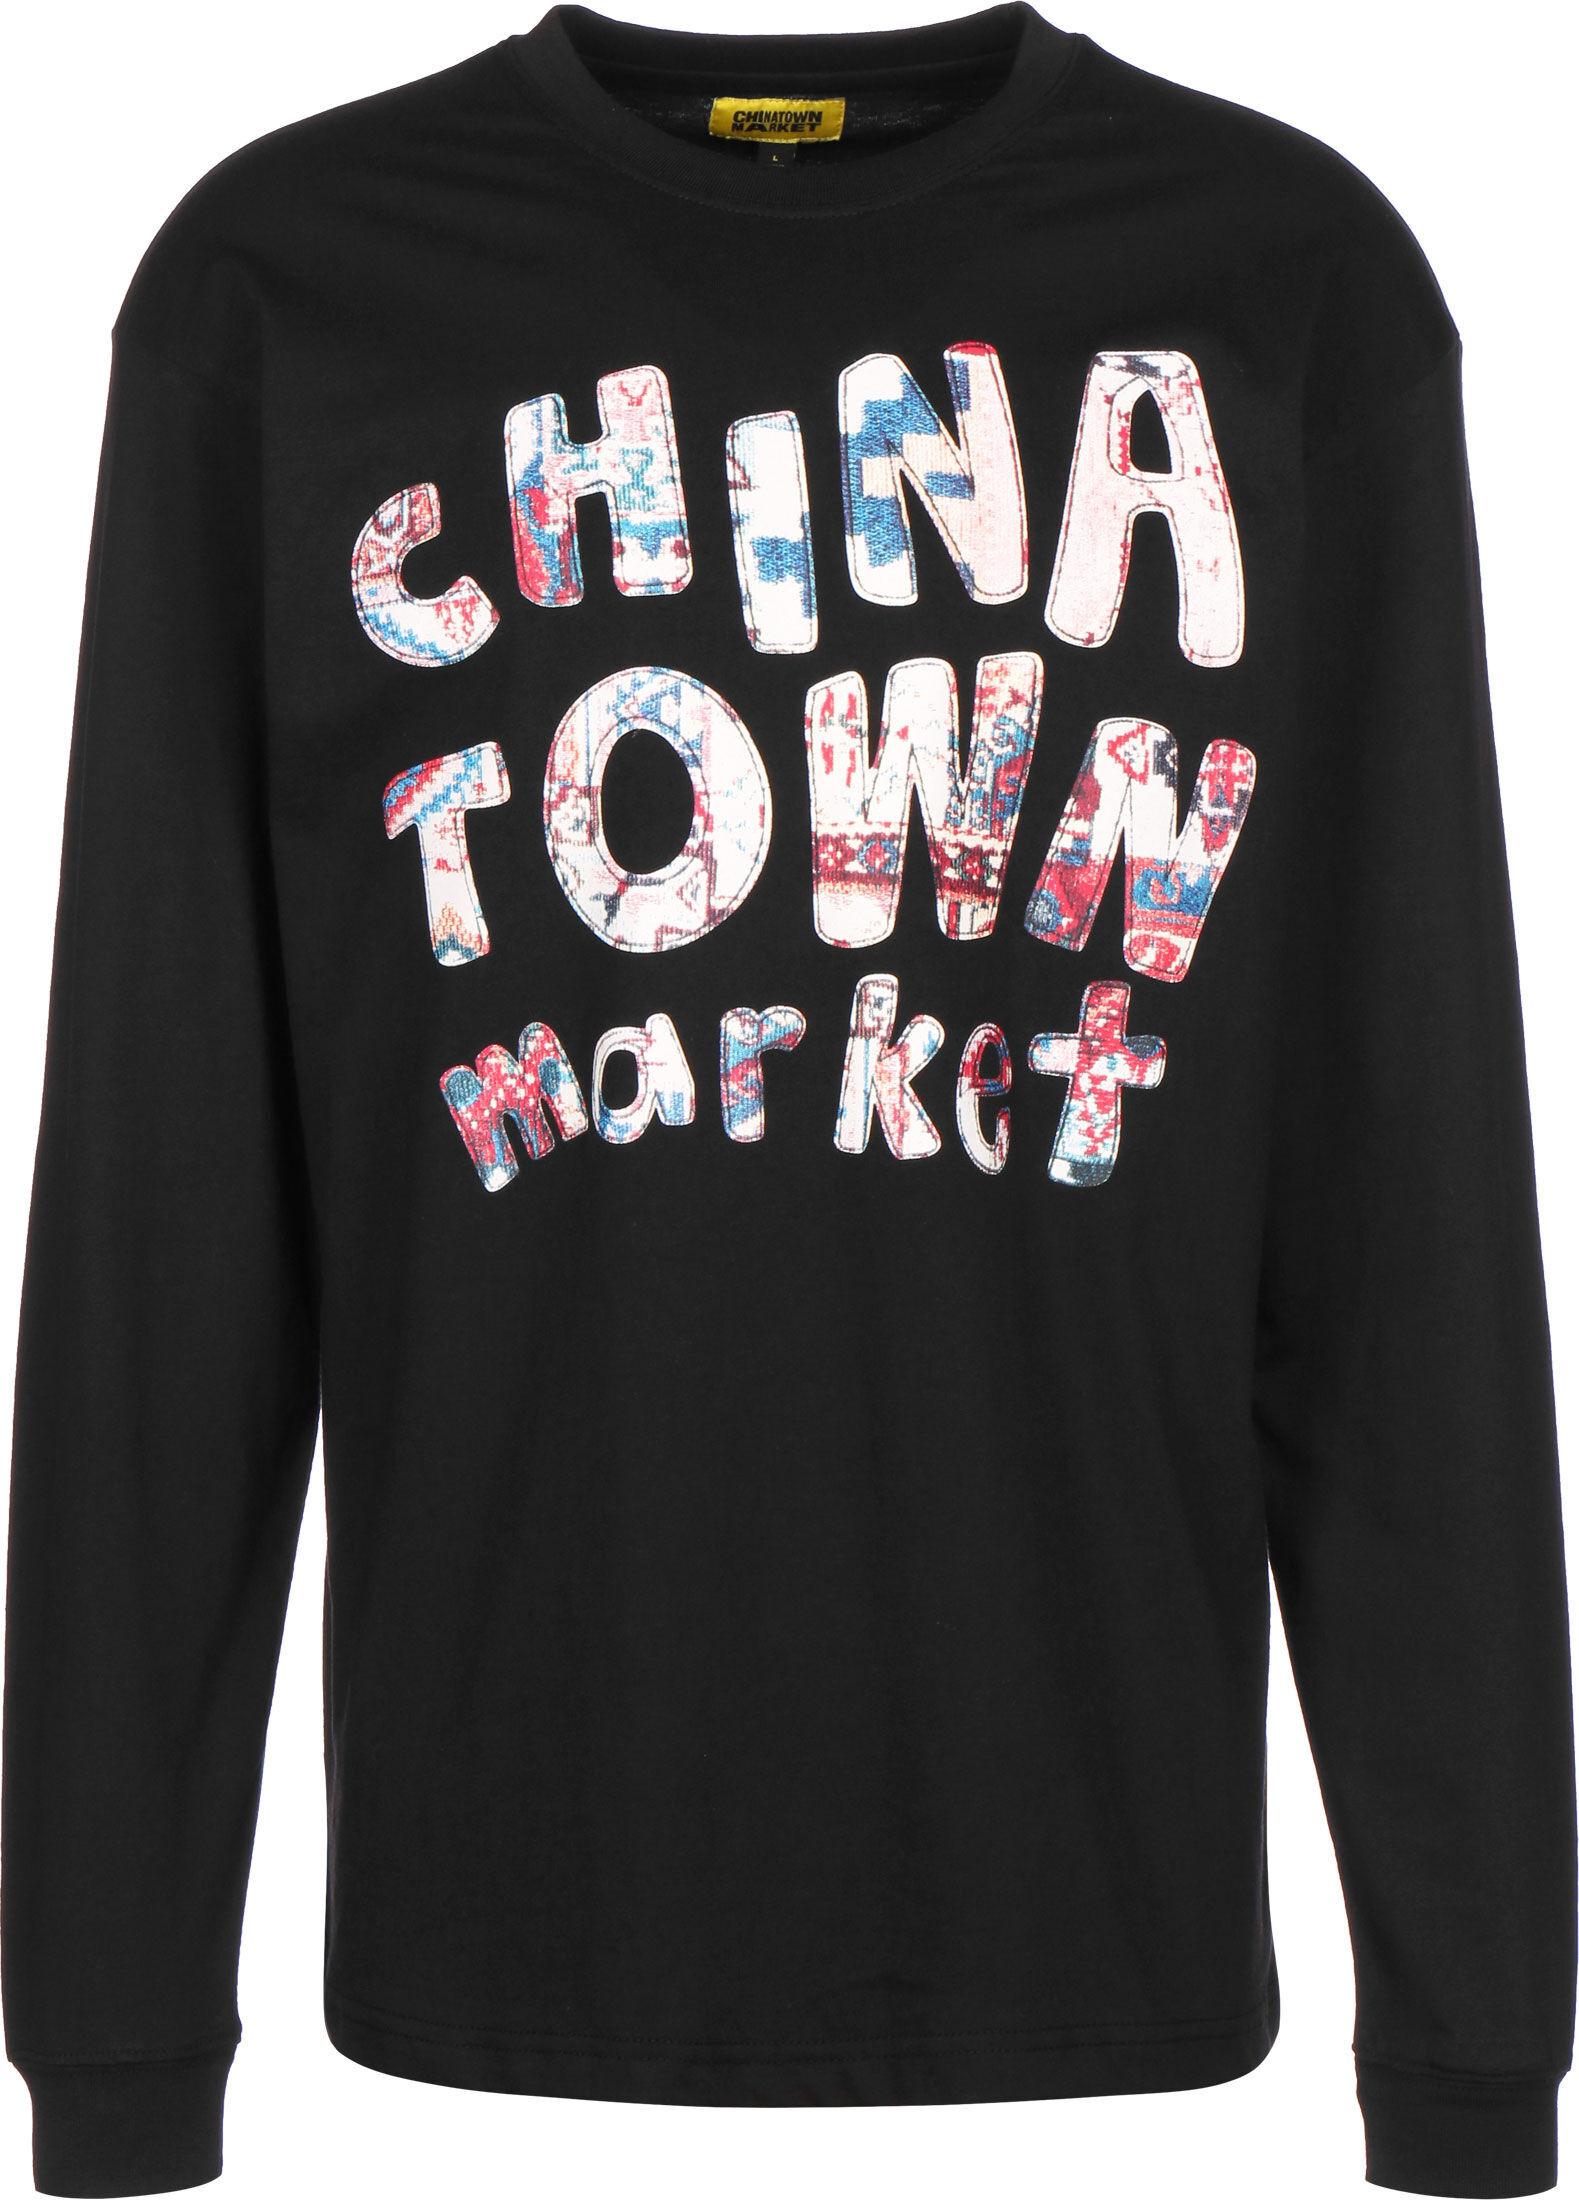 Chinatown Market Rug Dealer, taille L, homme, noir